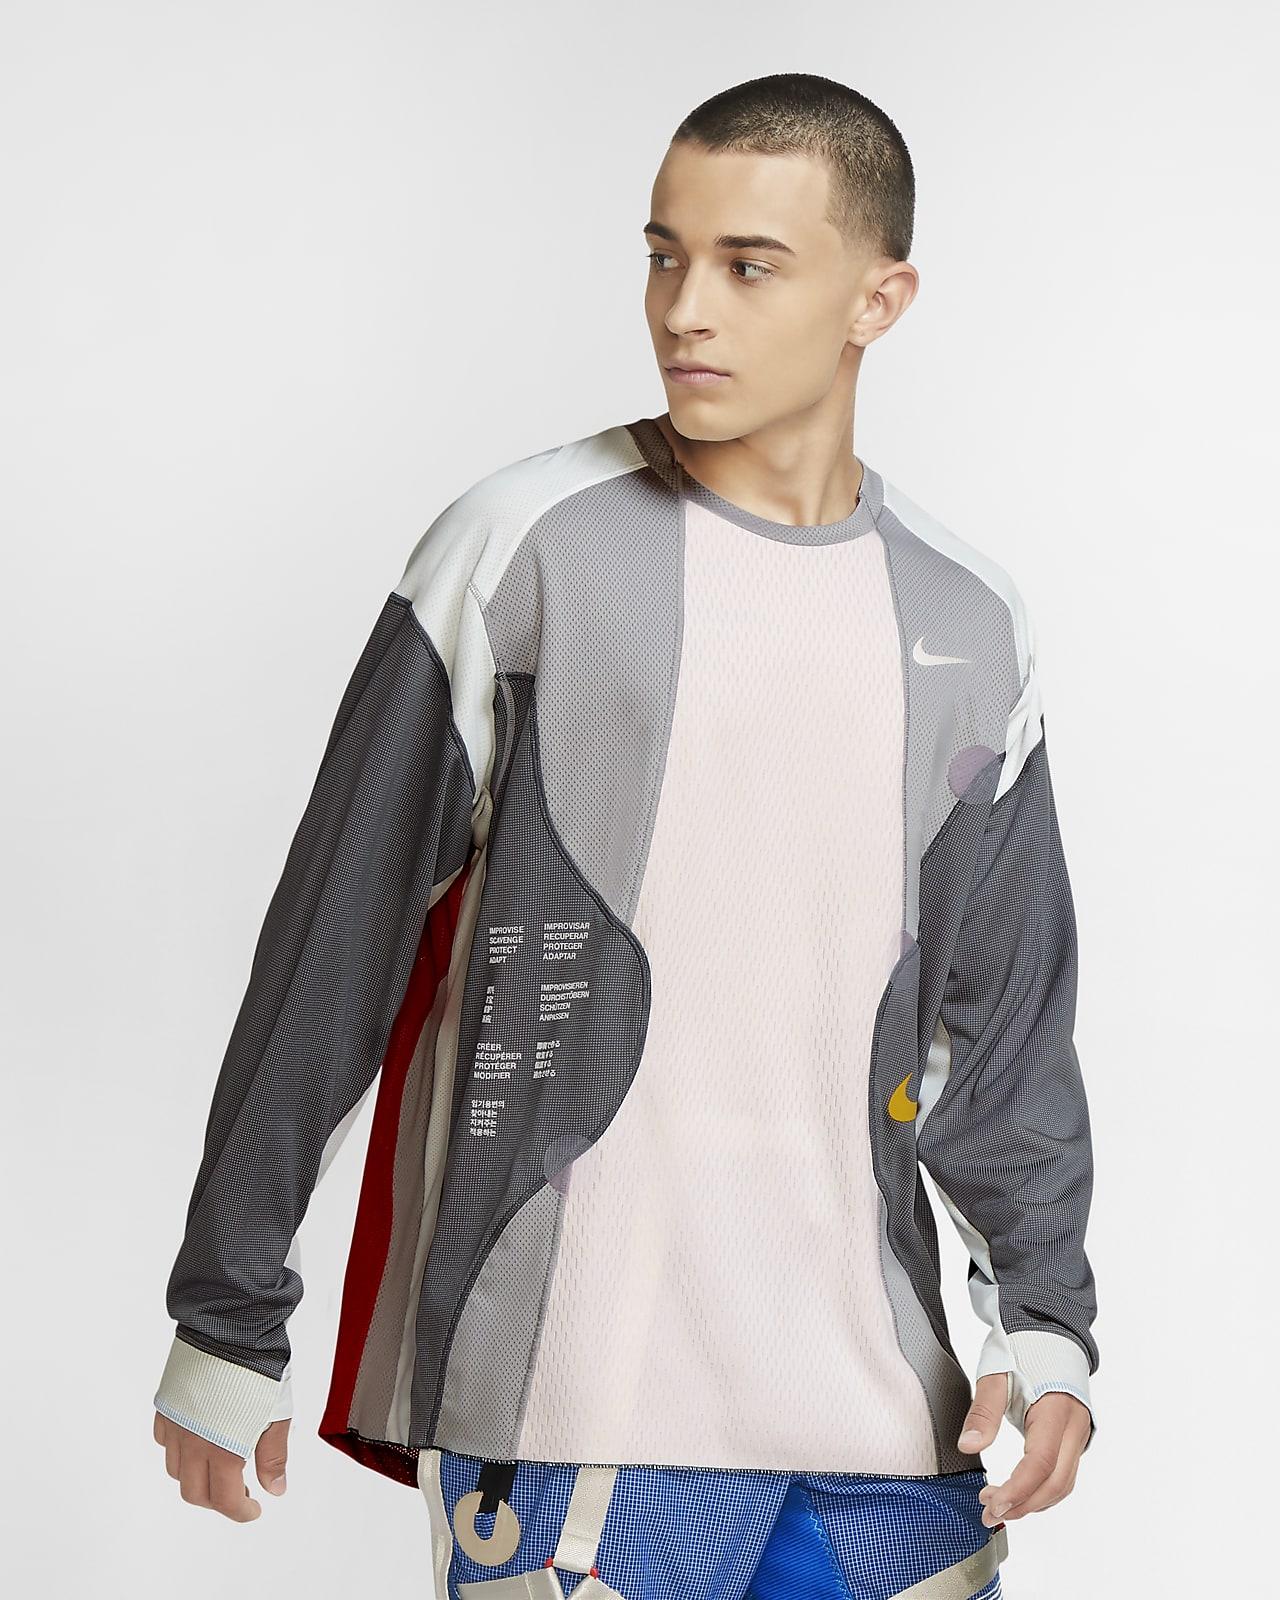 Haut à manches longues Nike Dri-FIT ISPA